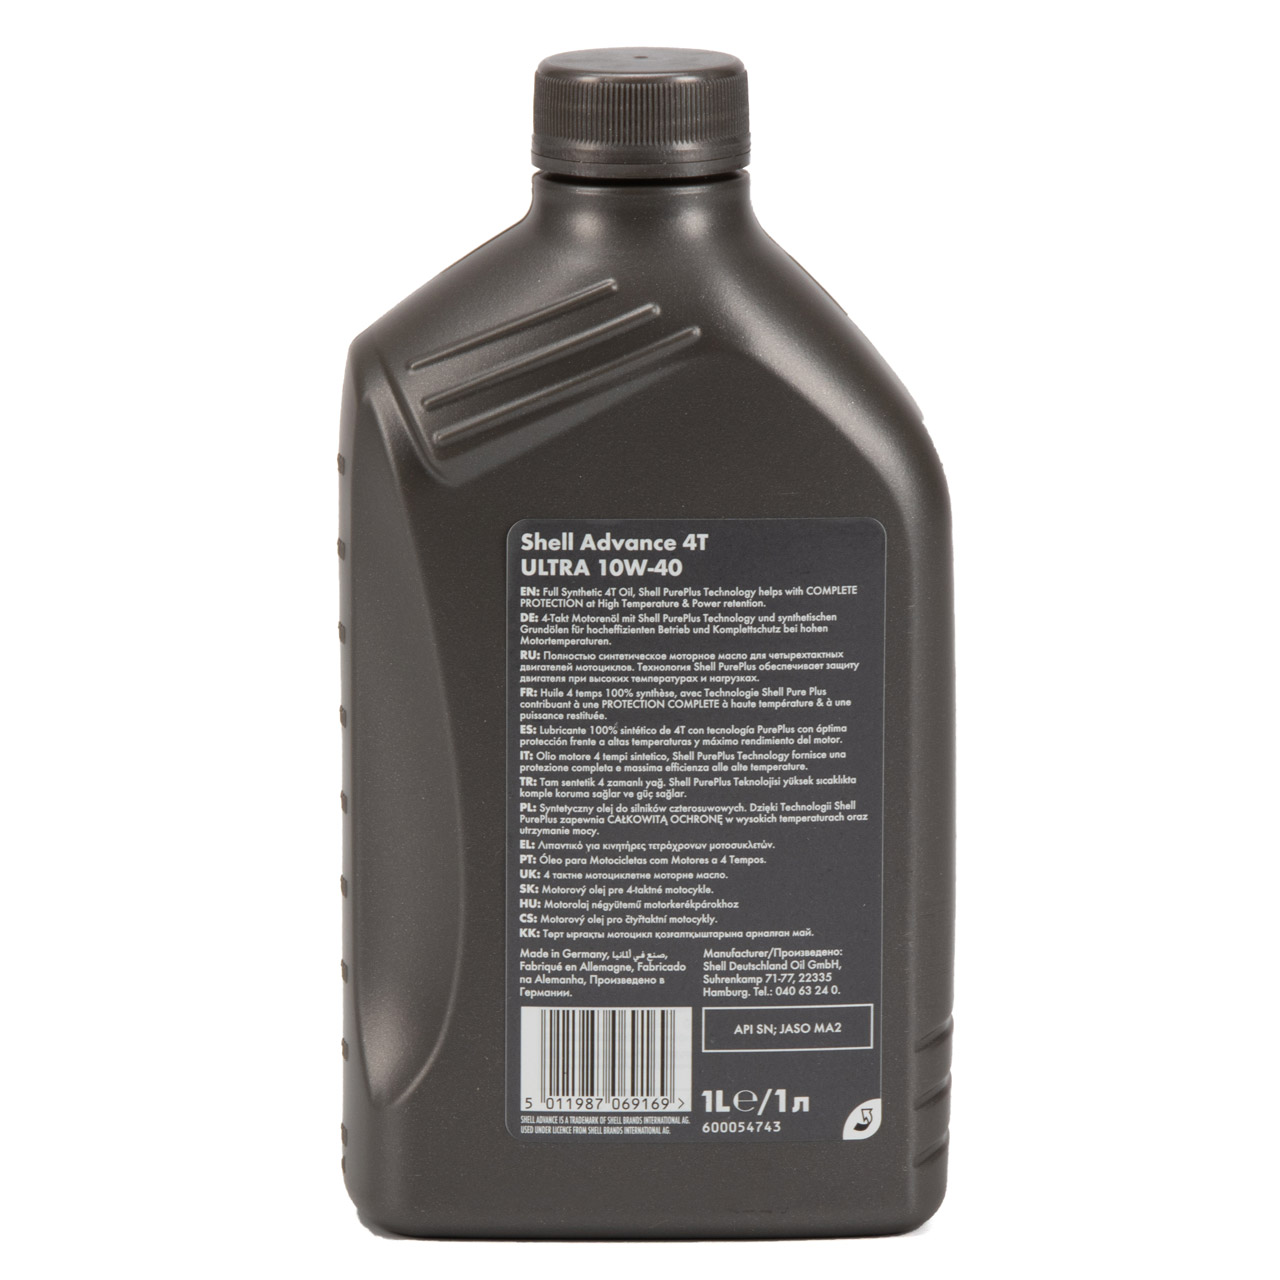 SHELL Motoröl Öl ADVANCE ULTRA 4T 4-TAKT 10W-40 API SN JASO MA-2 - 1L 1 Liter